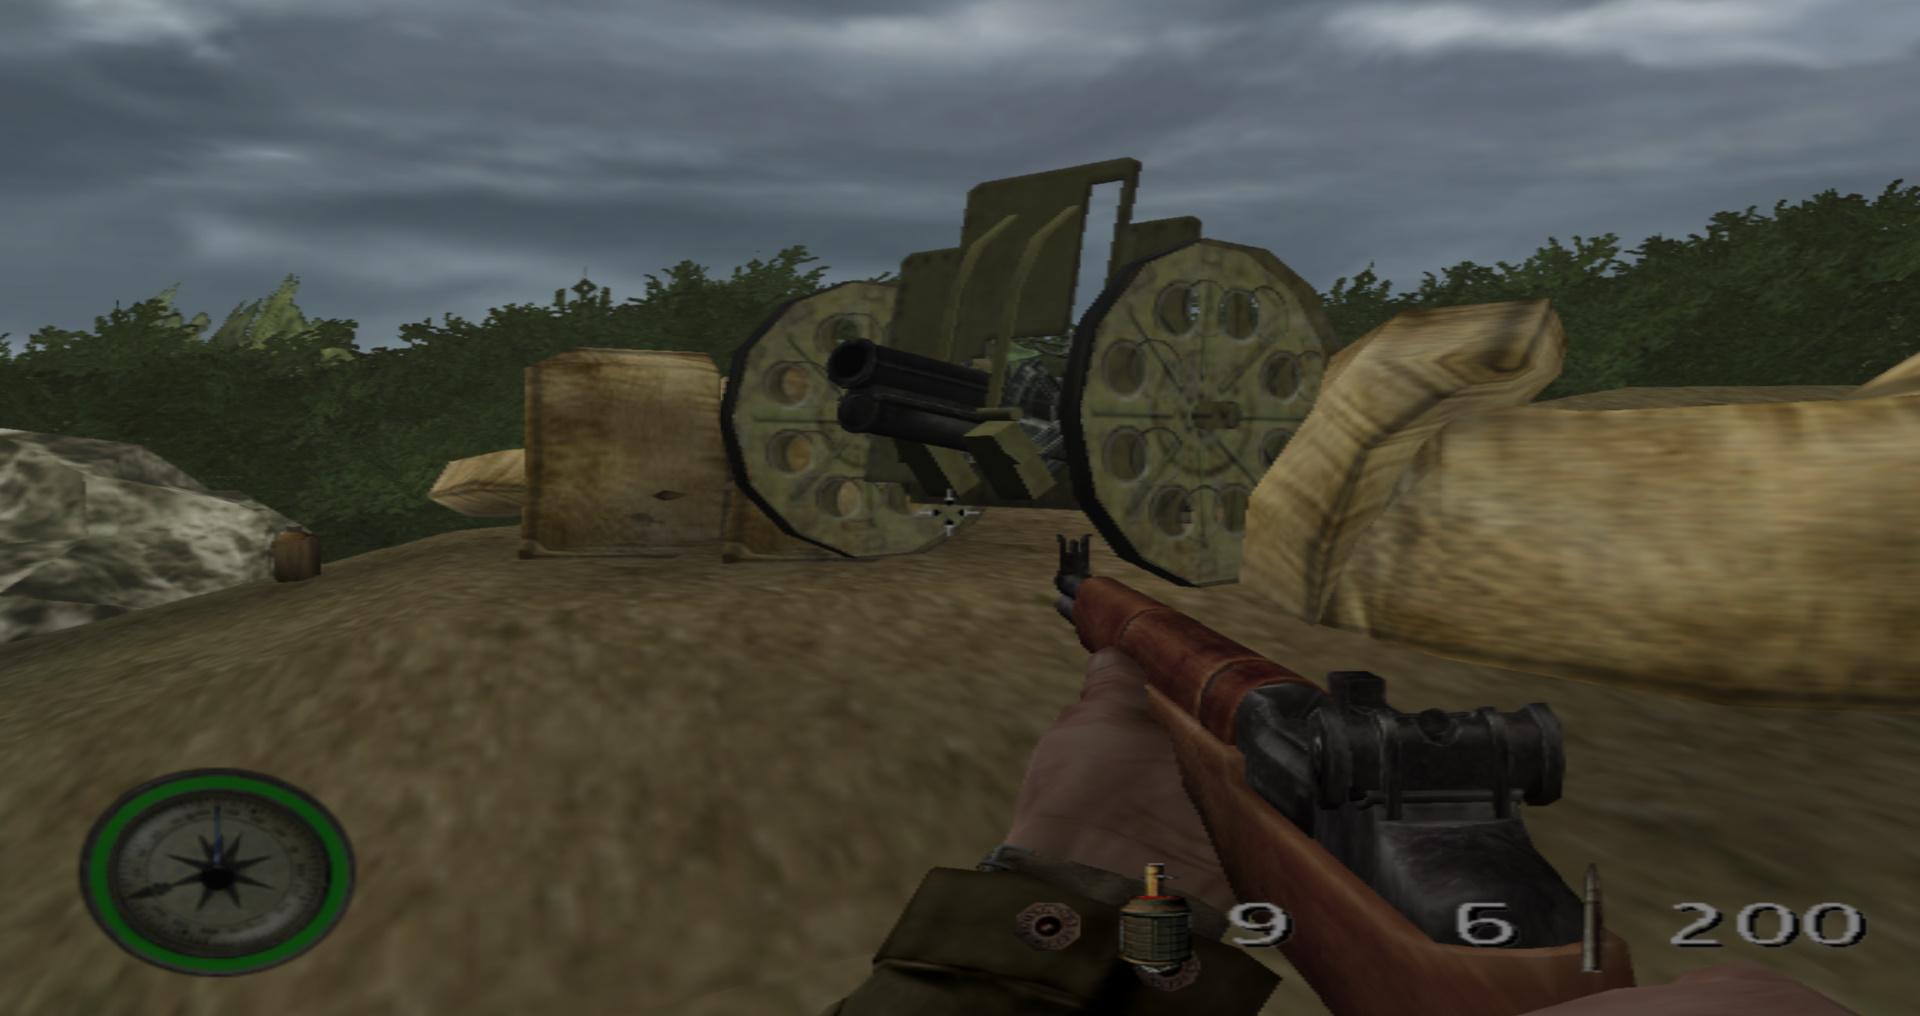 Type 92 Pack Howitzer